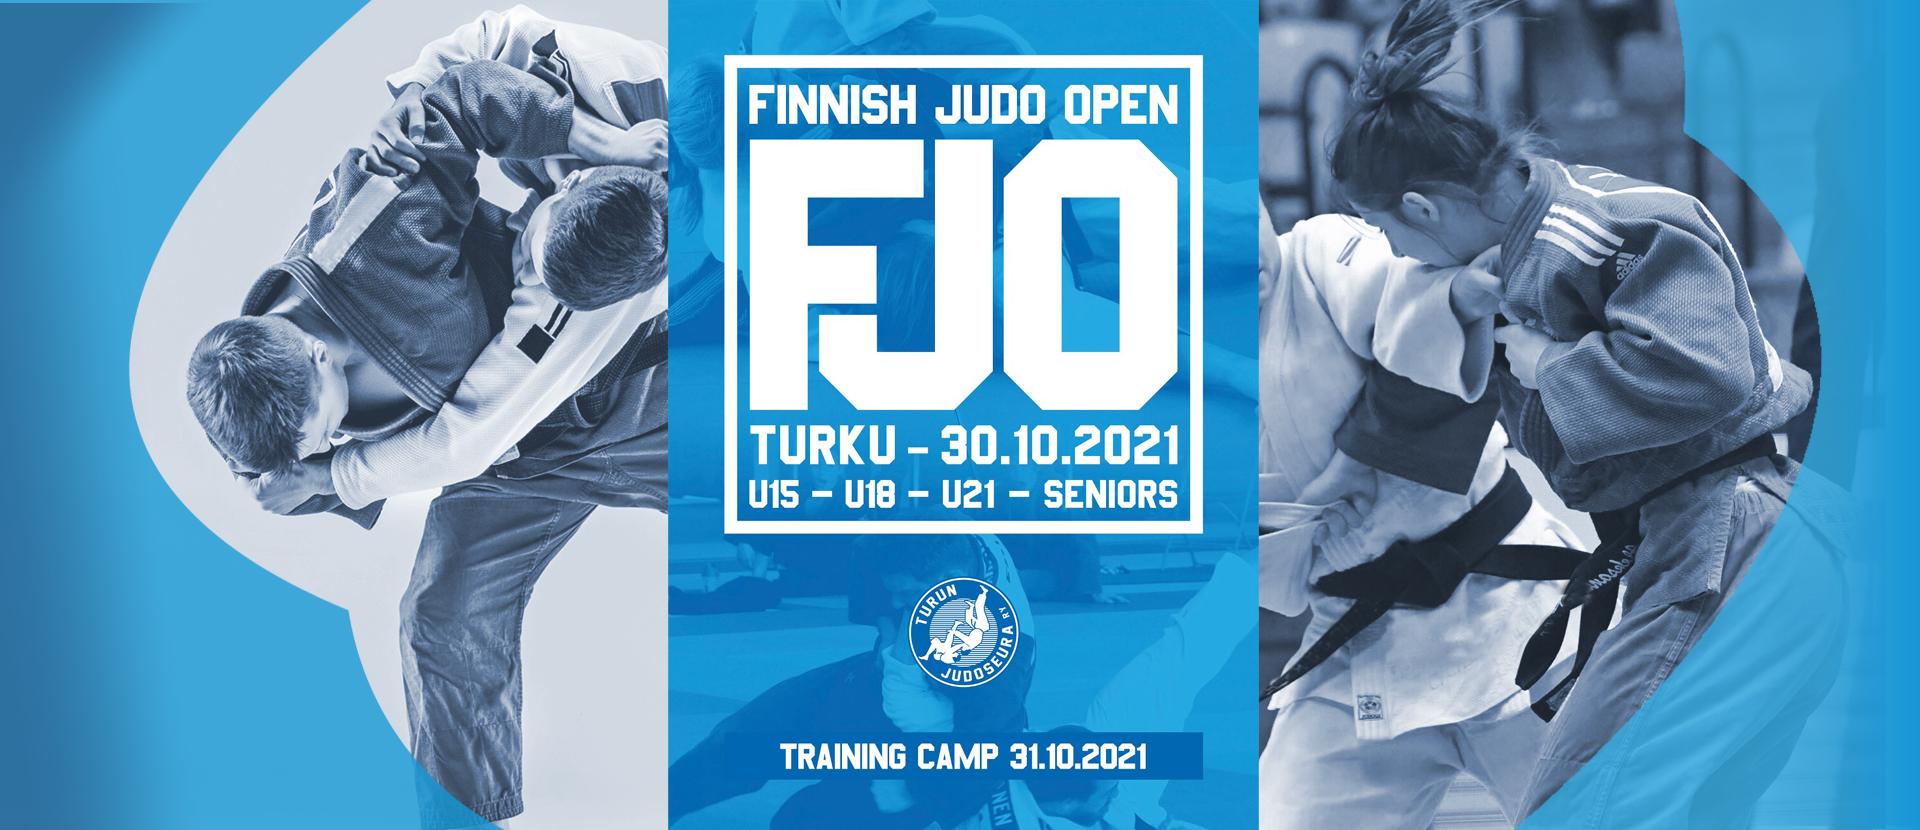 Finnish Judo Open